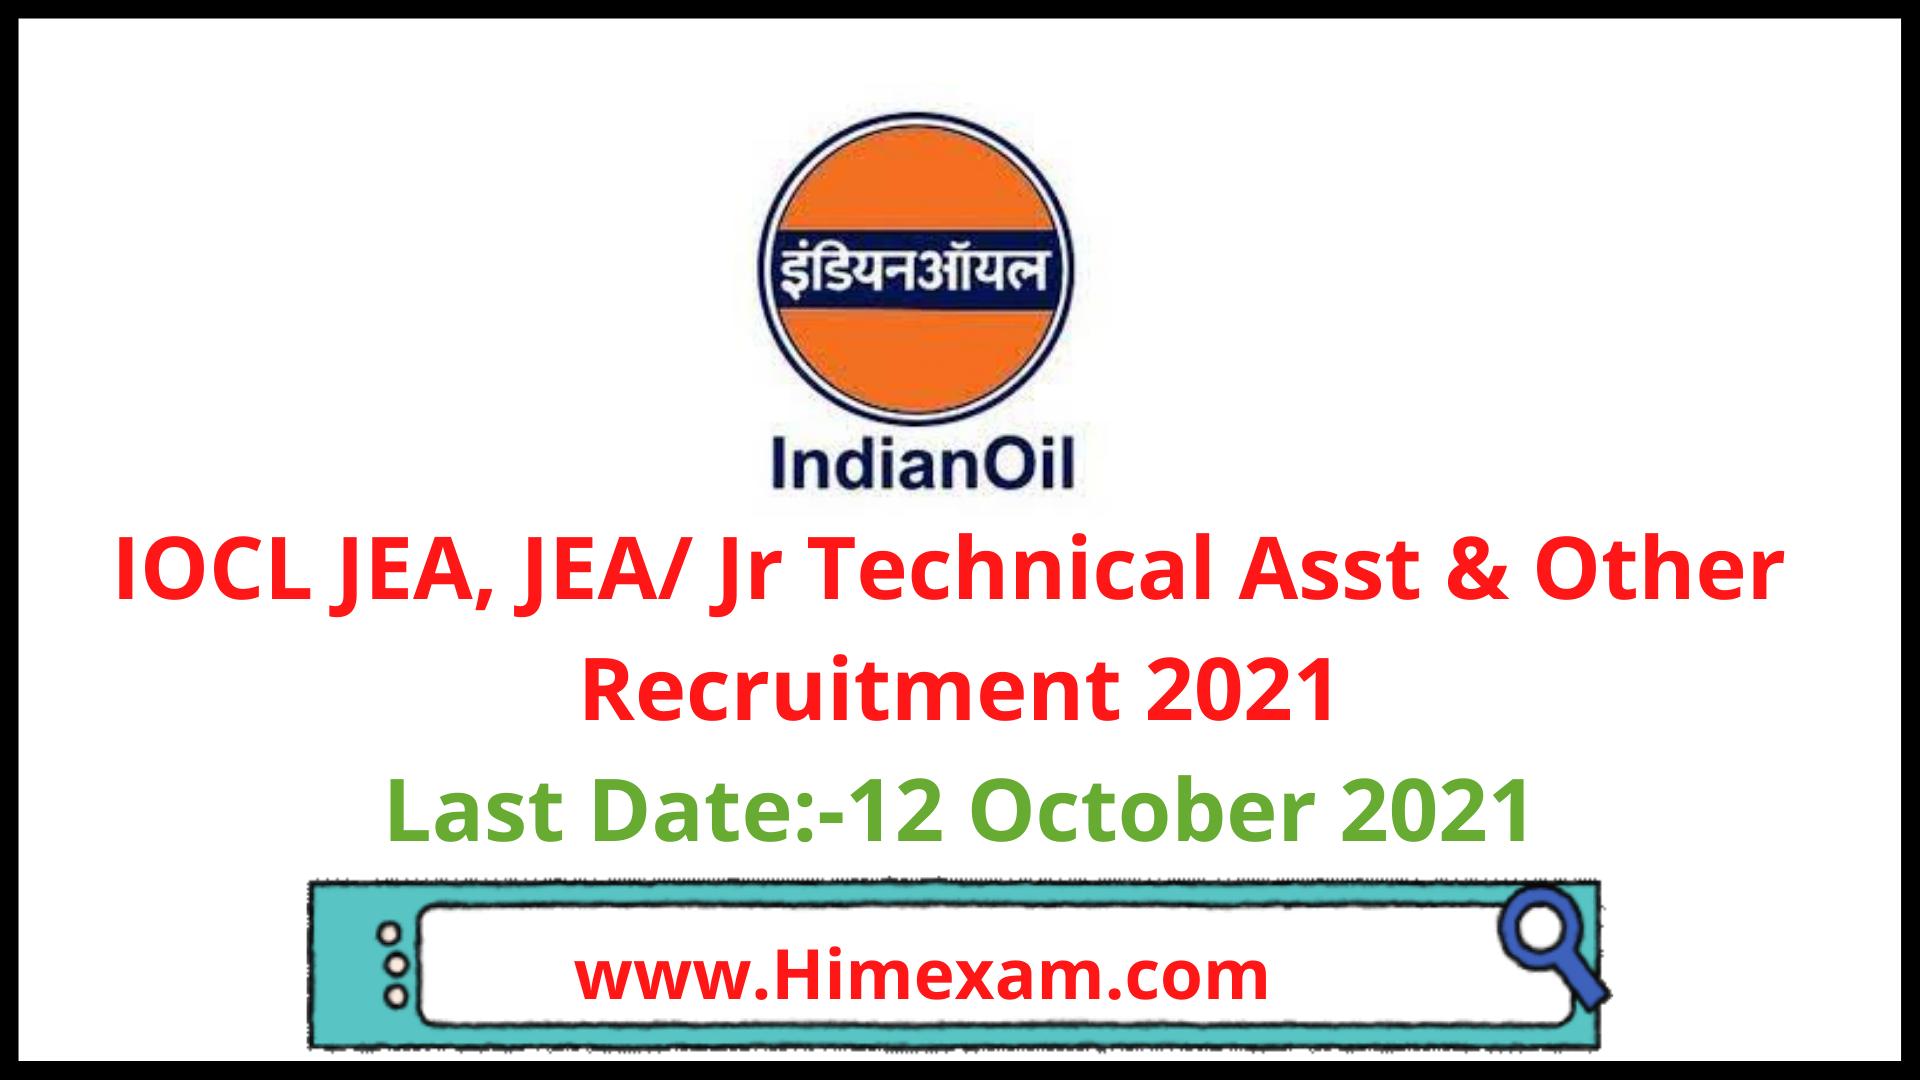 IOCL JEA, JEA/ Jr Technical Asst & Other  Recruitment 2021